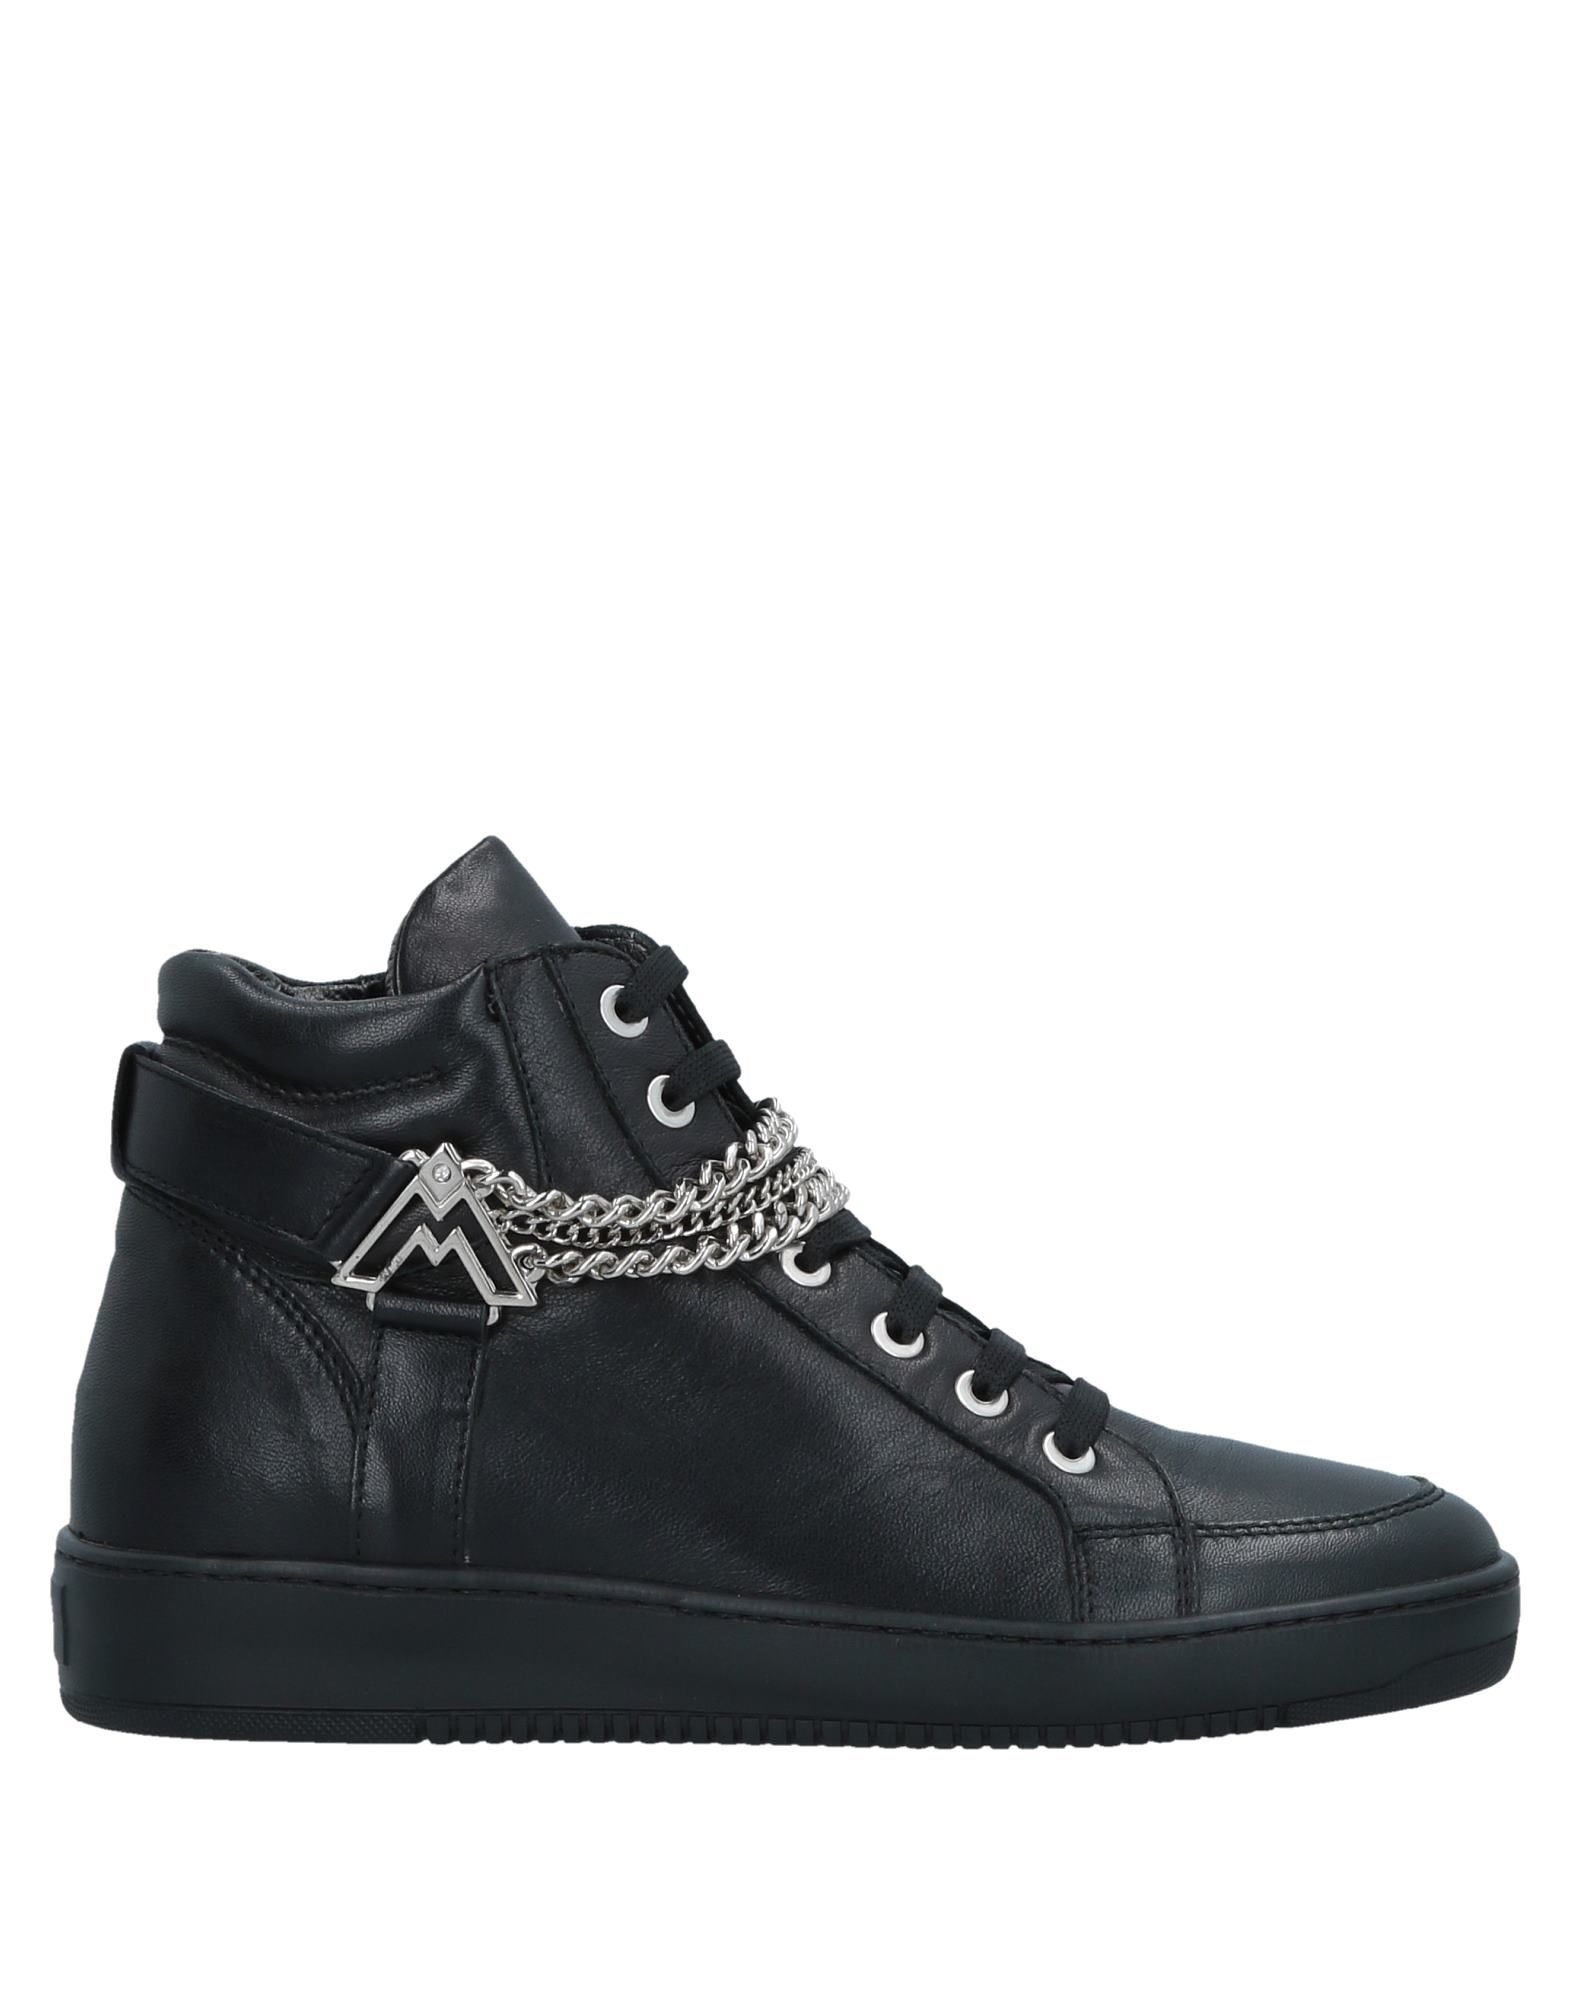 Andrea Morelli Sneakers Damen  11525827CE Gute Qualität beliebte Schuhe